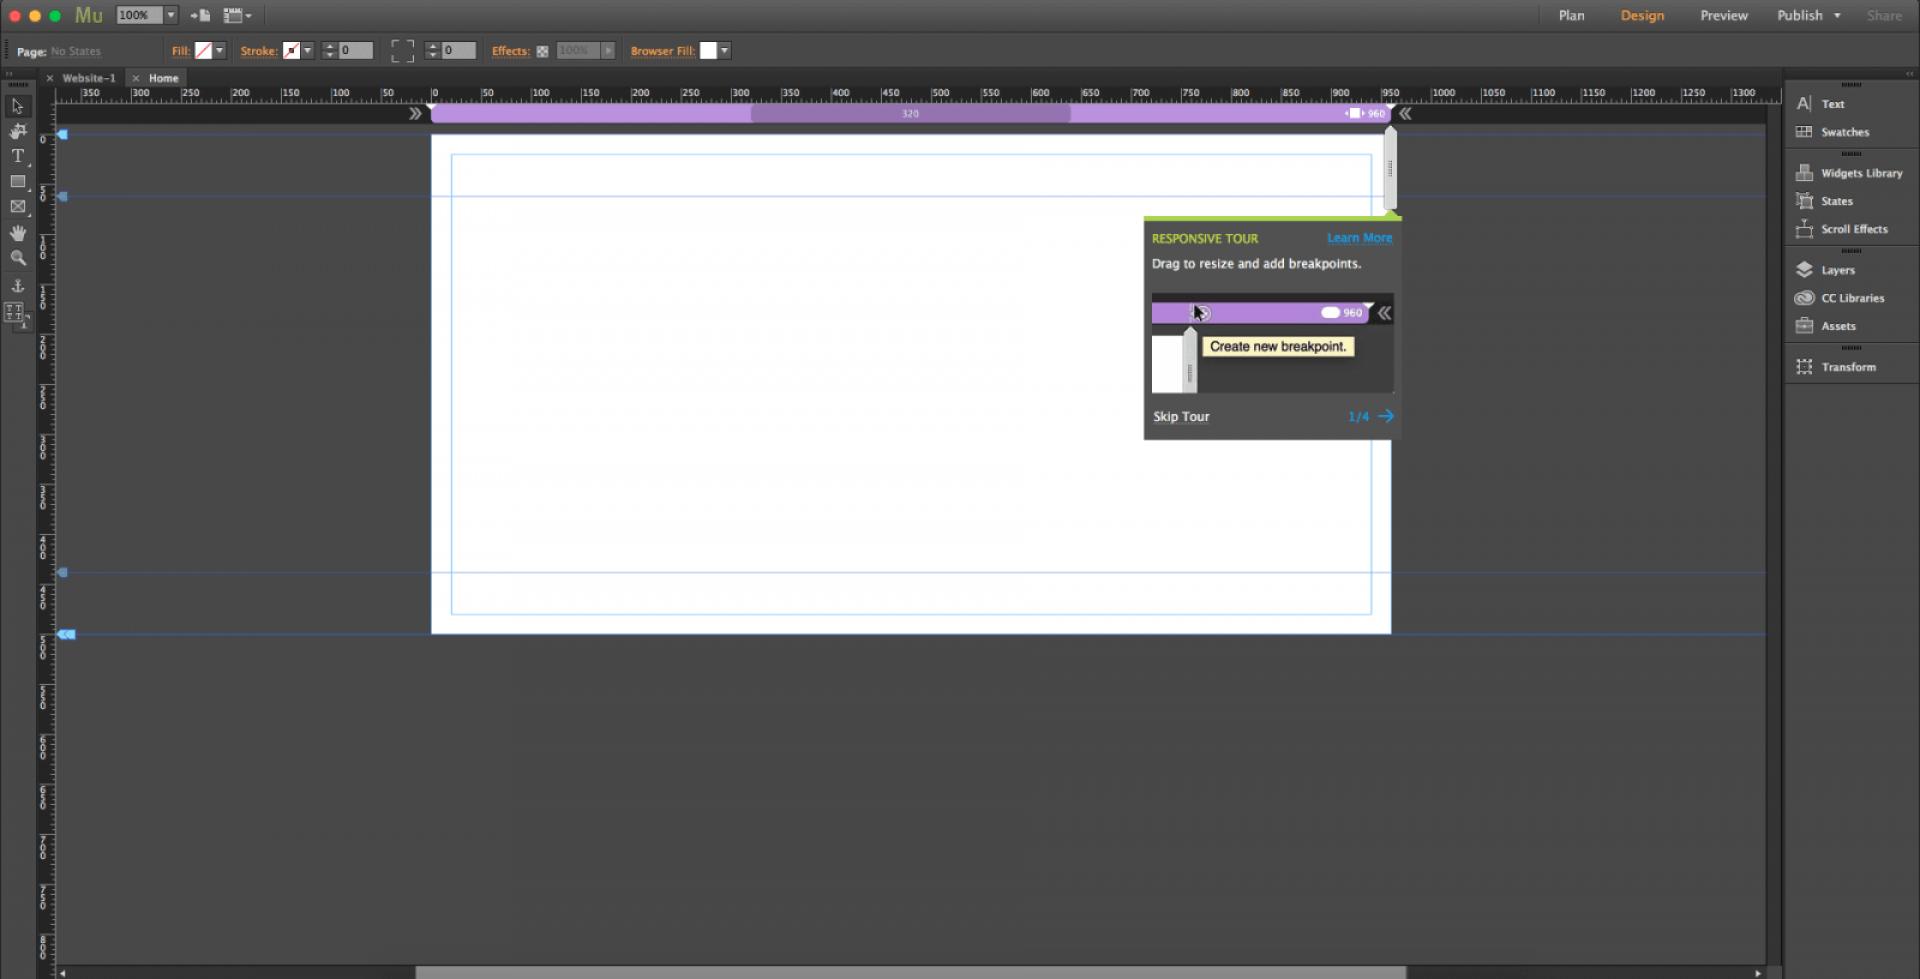 Adobe muse screenshot